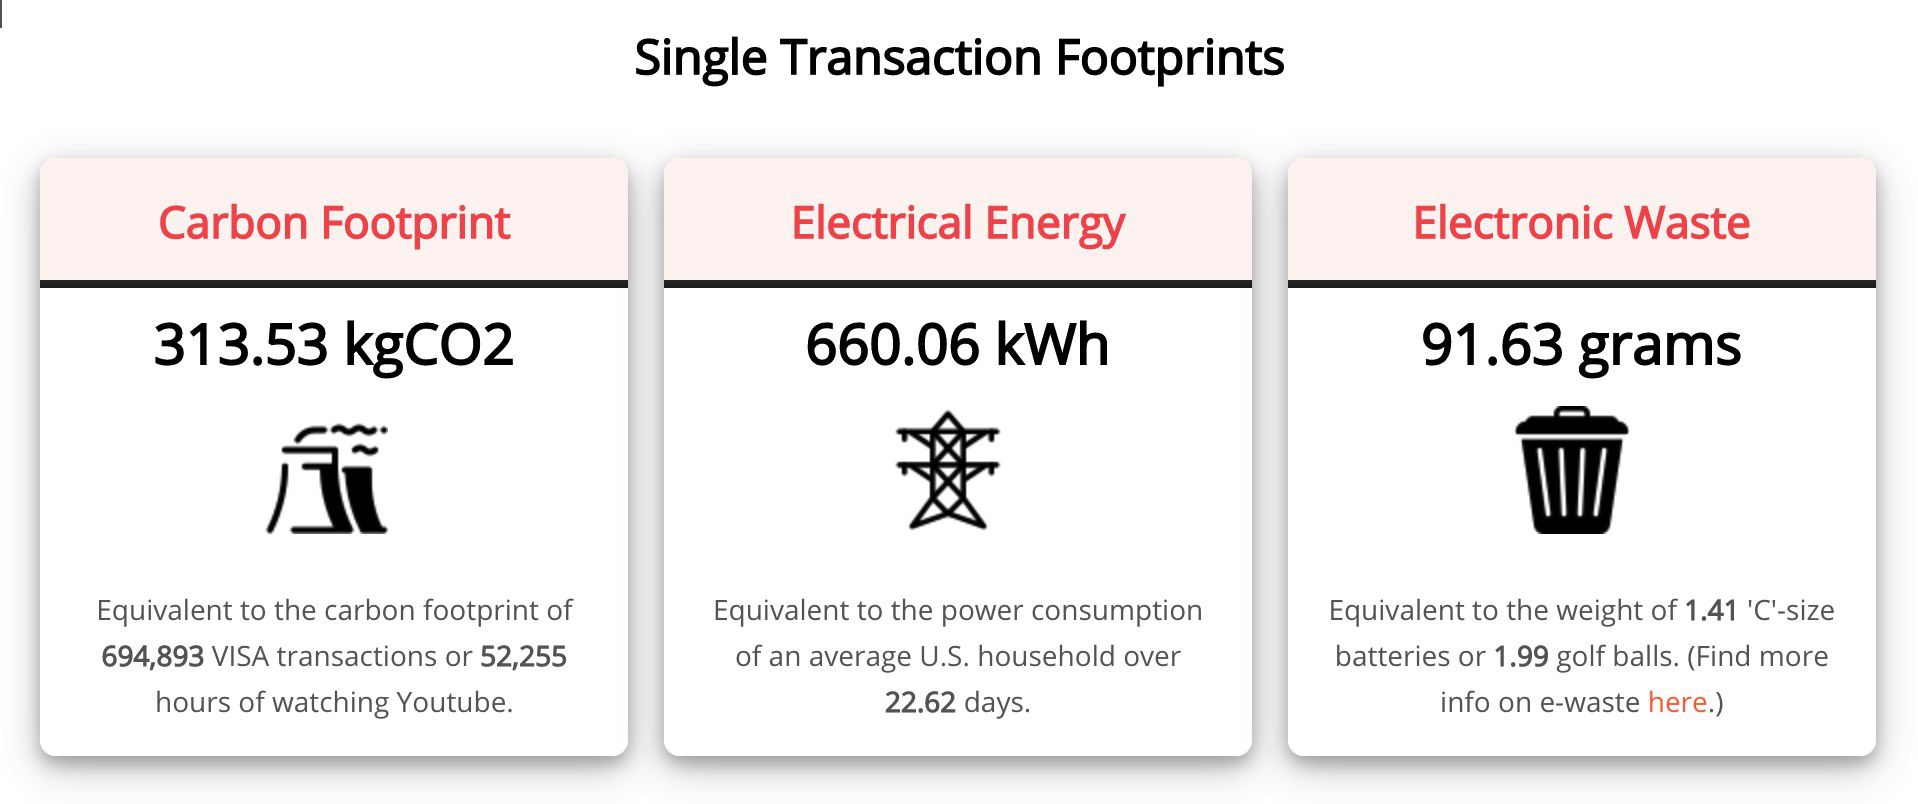 Transaction footprint